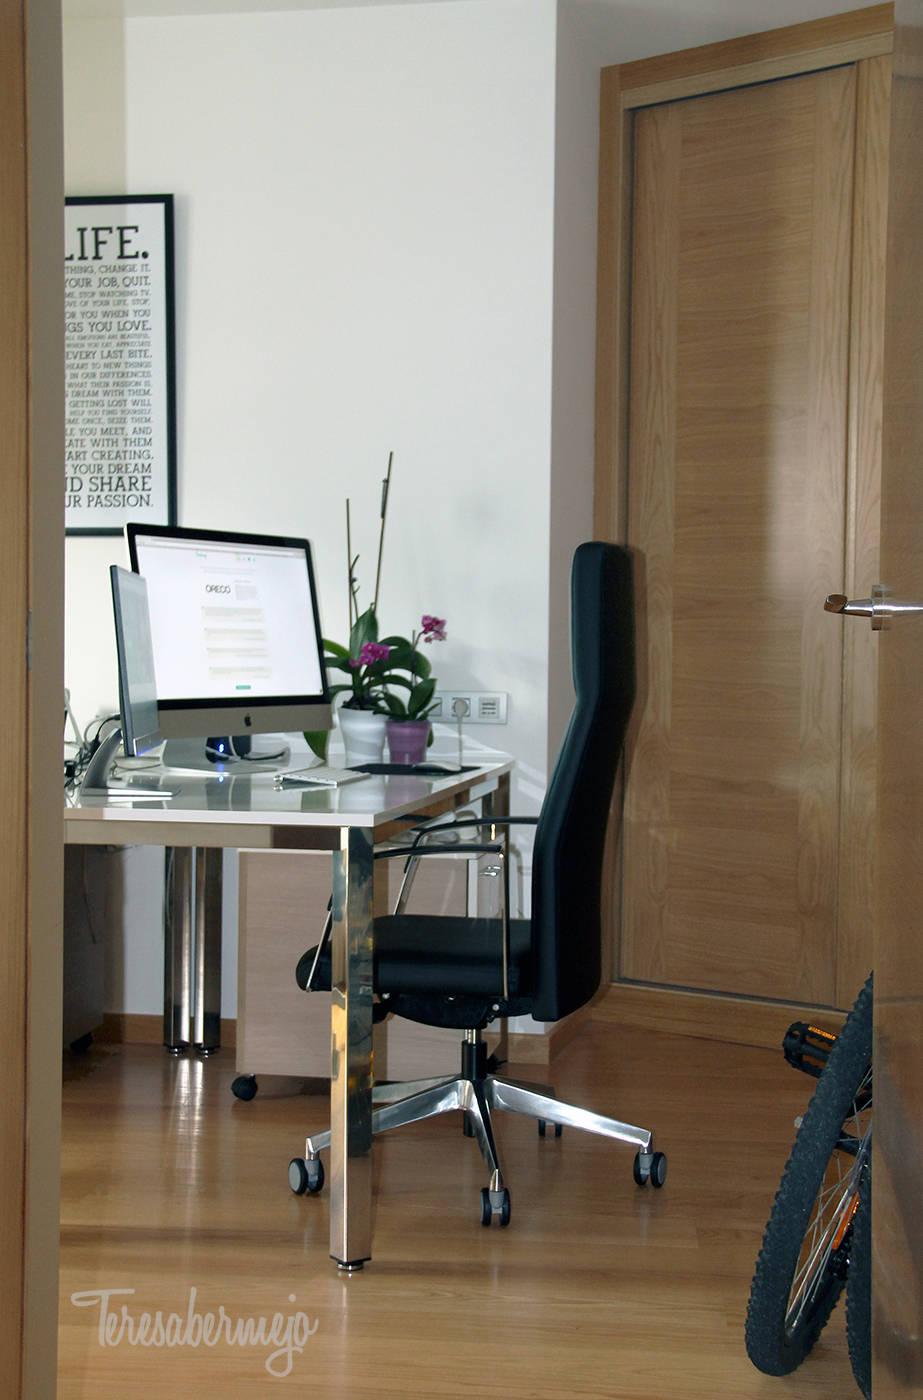 Oficina en casa door dise adora de interiores decoradora - Disenadora de interiores ...